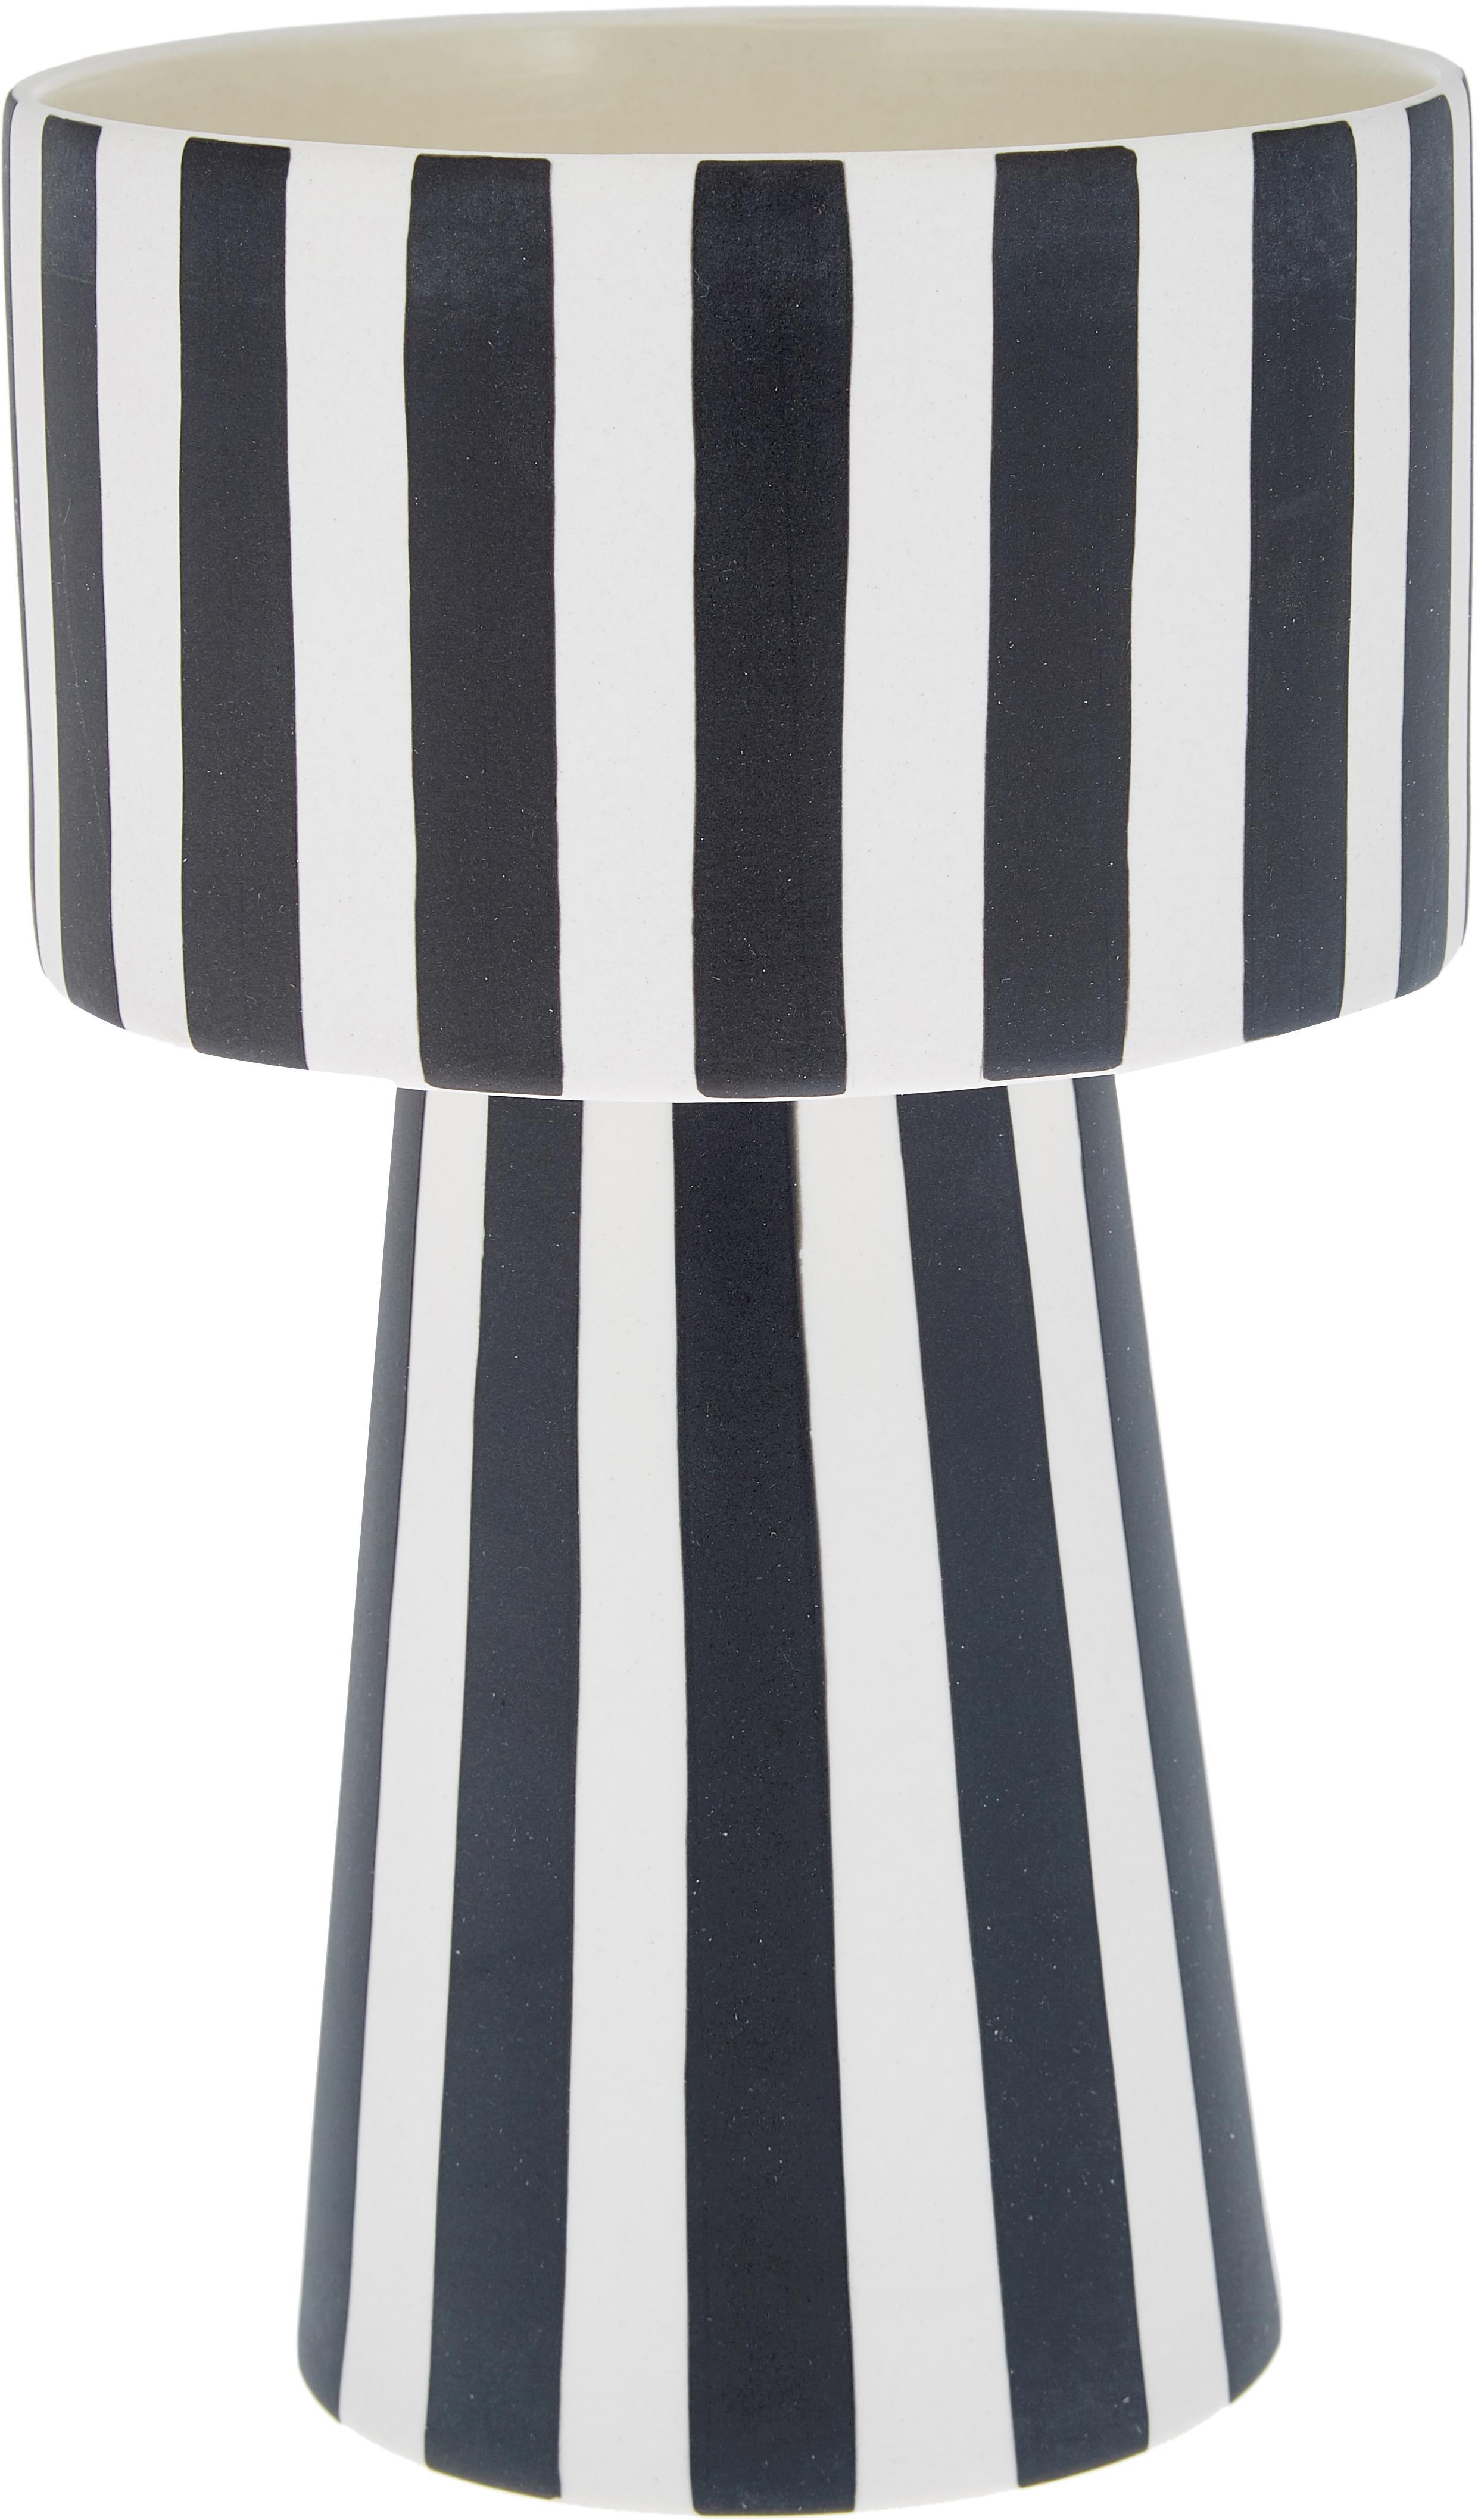 Macetero artesanal  Toppu, Cerámica, Blanco, negro, Ø 15 x Al 24 cm